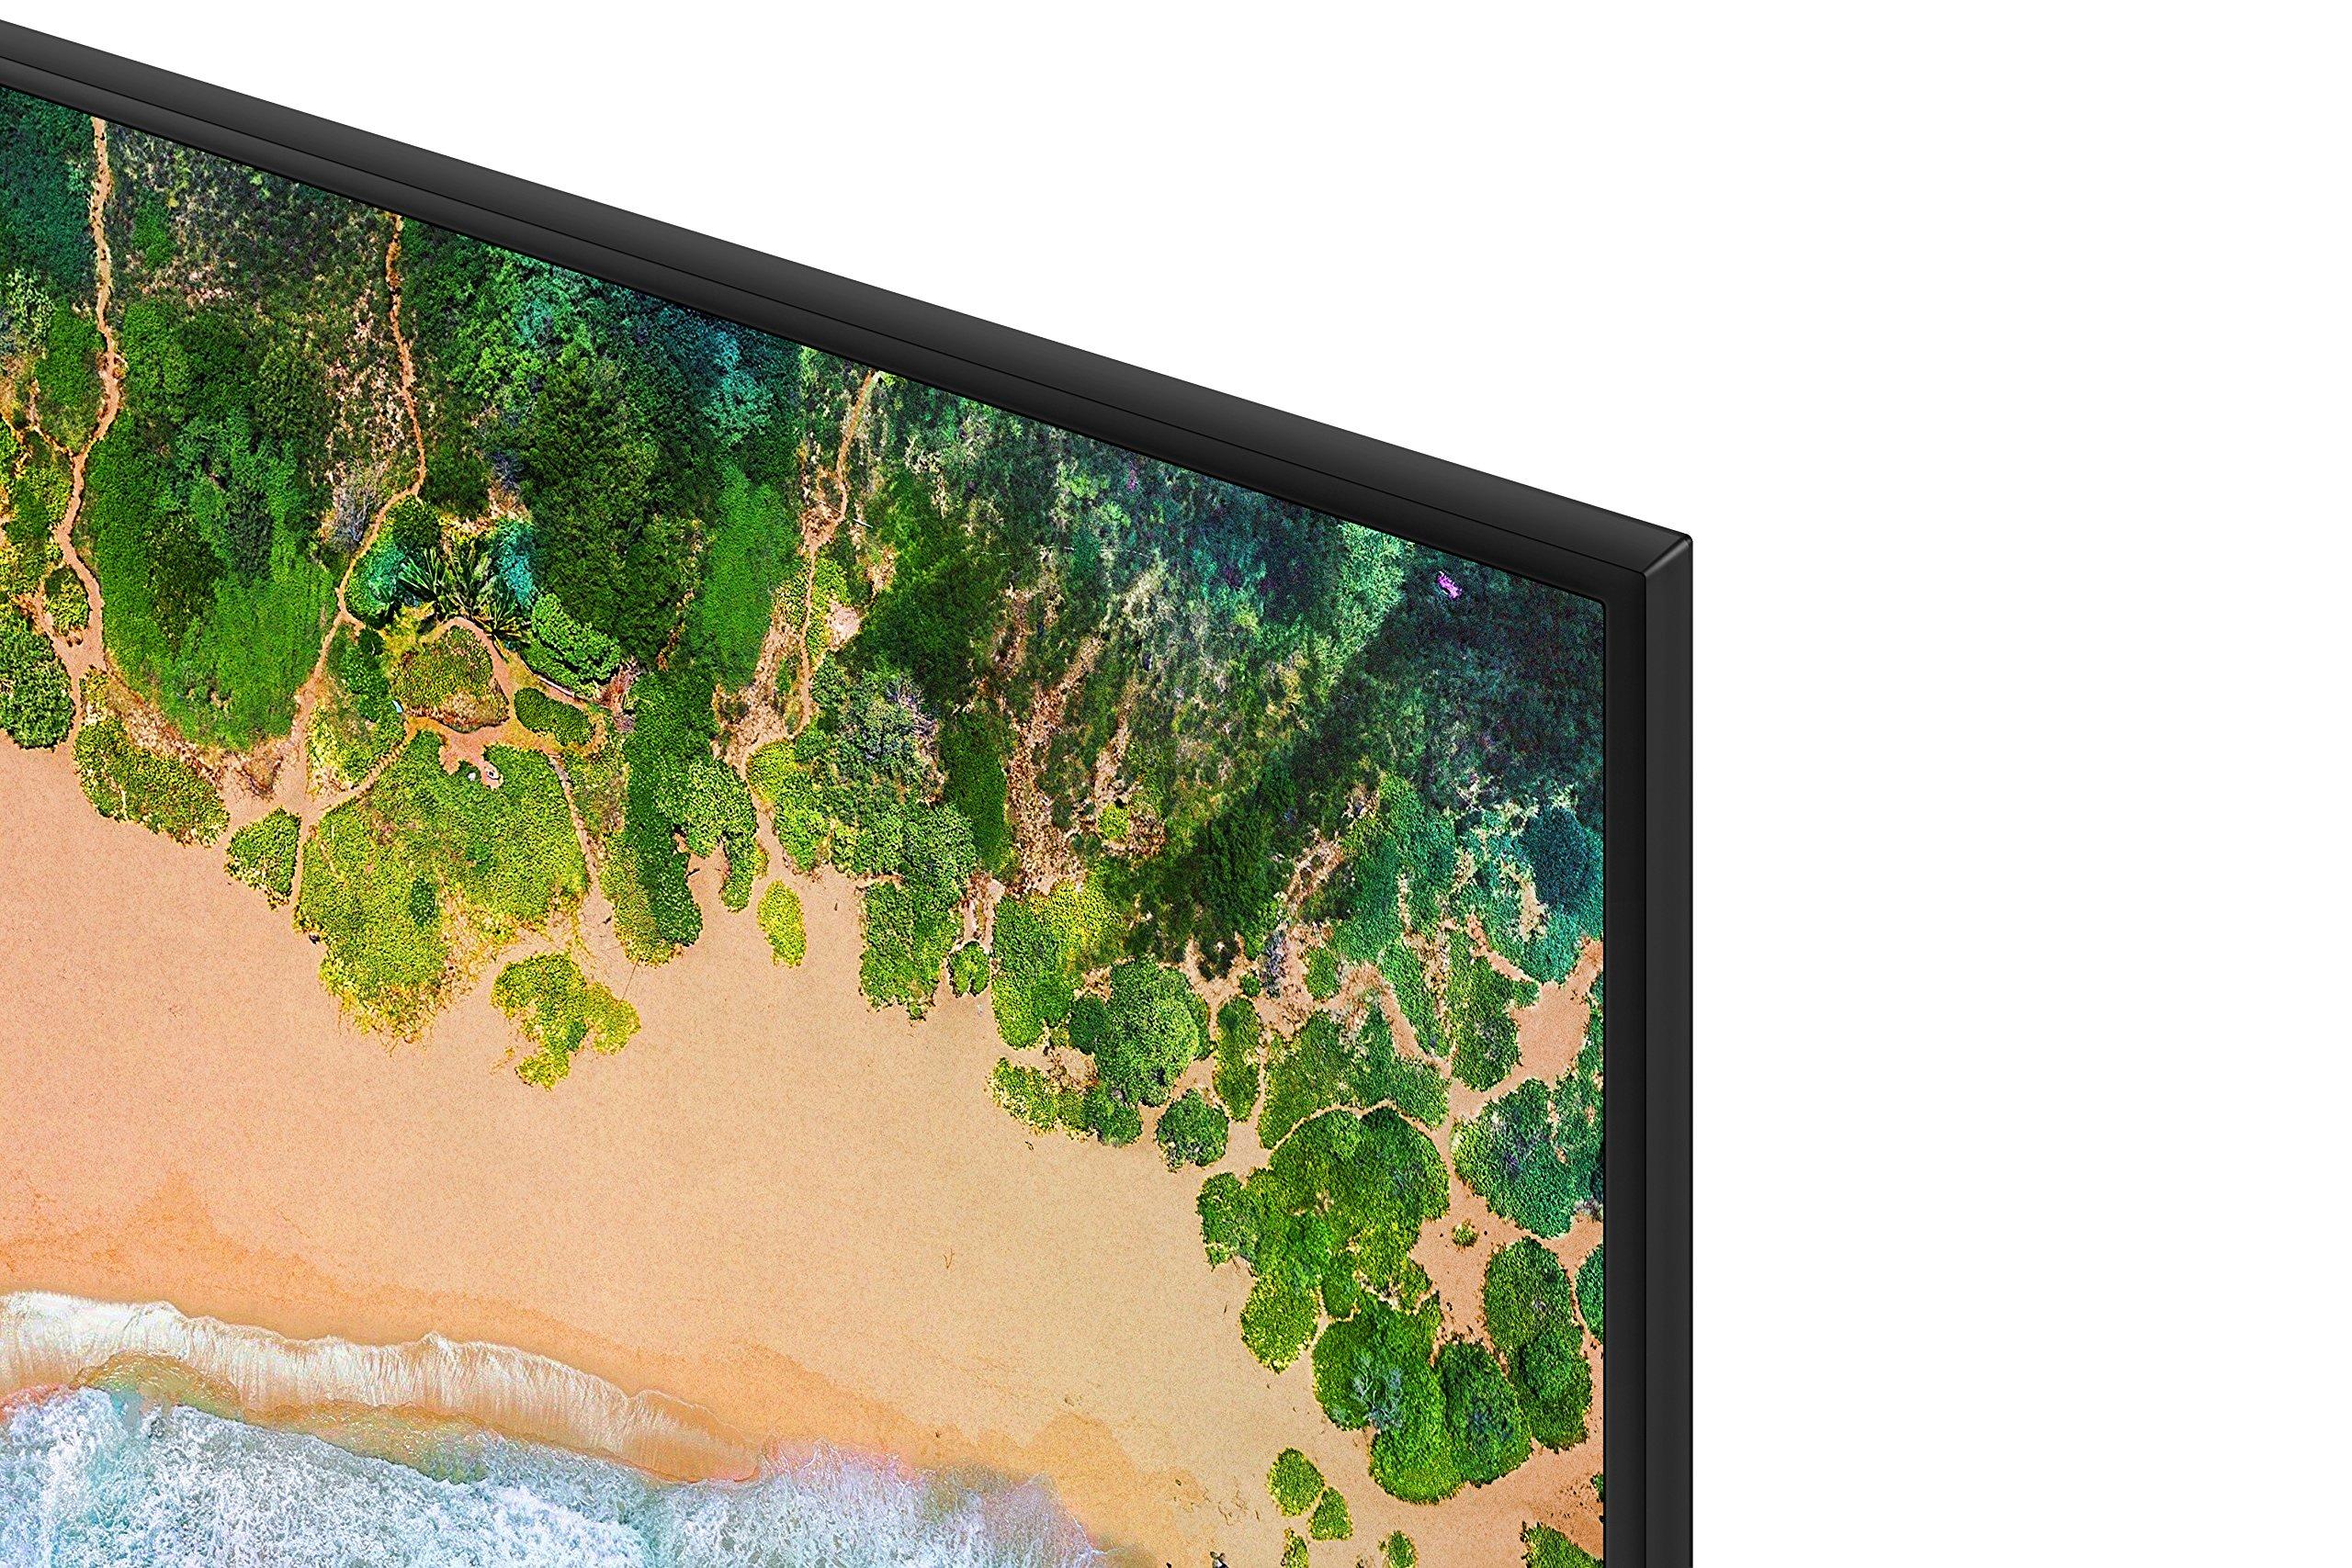 Samsung UN50NU7100 Flat 50'' 4K UHD 7 Series Smart TV 2018 by Samsung (Image #16)